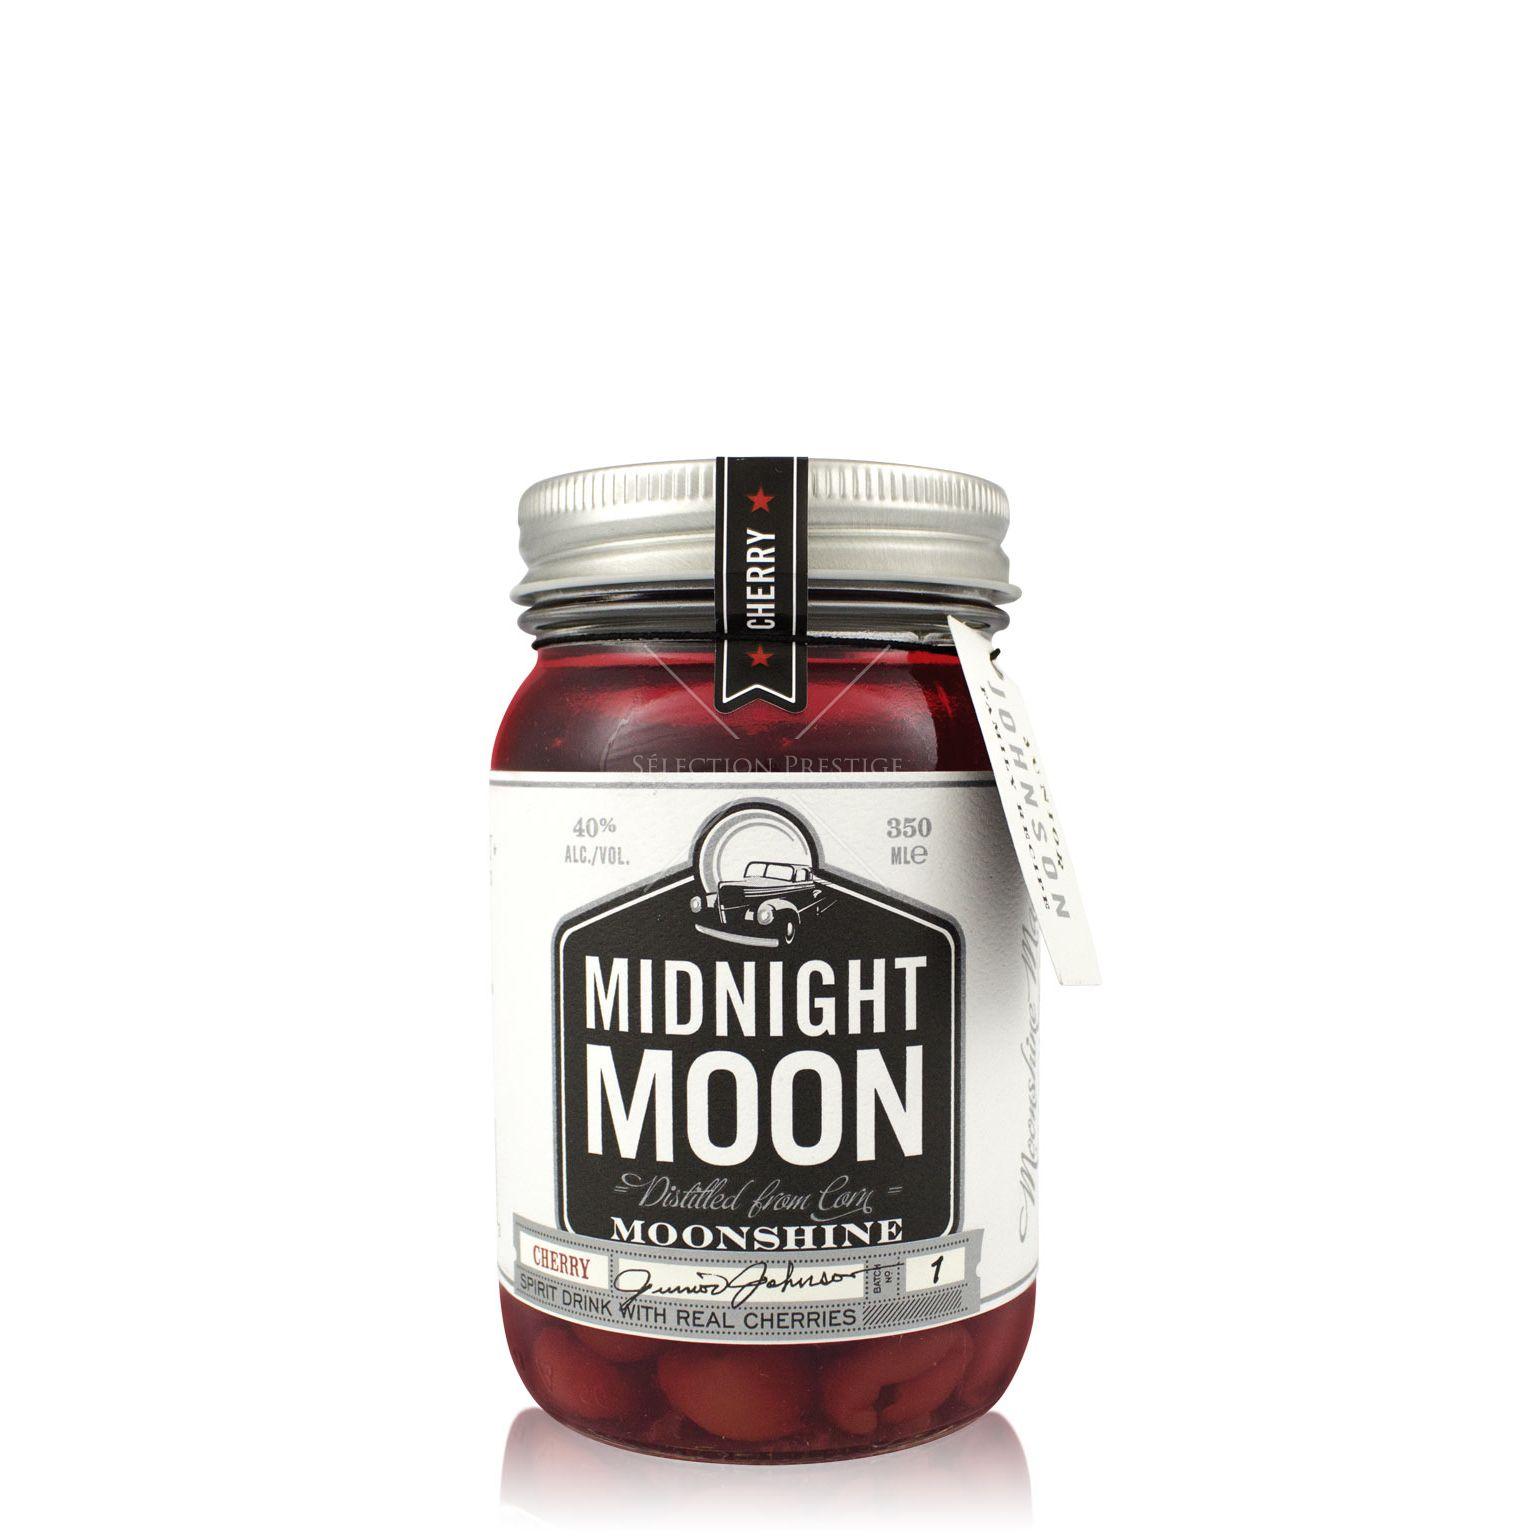 midnight moonshine drinks - photo #6